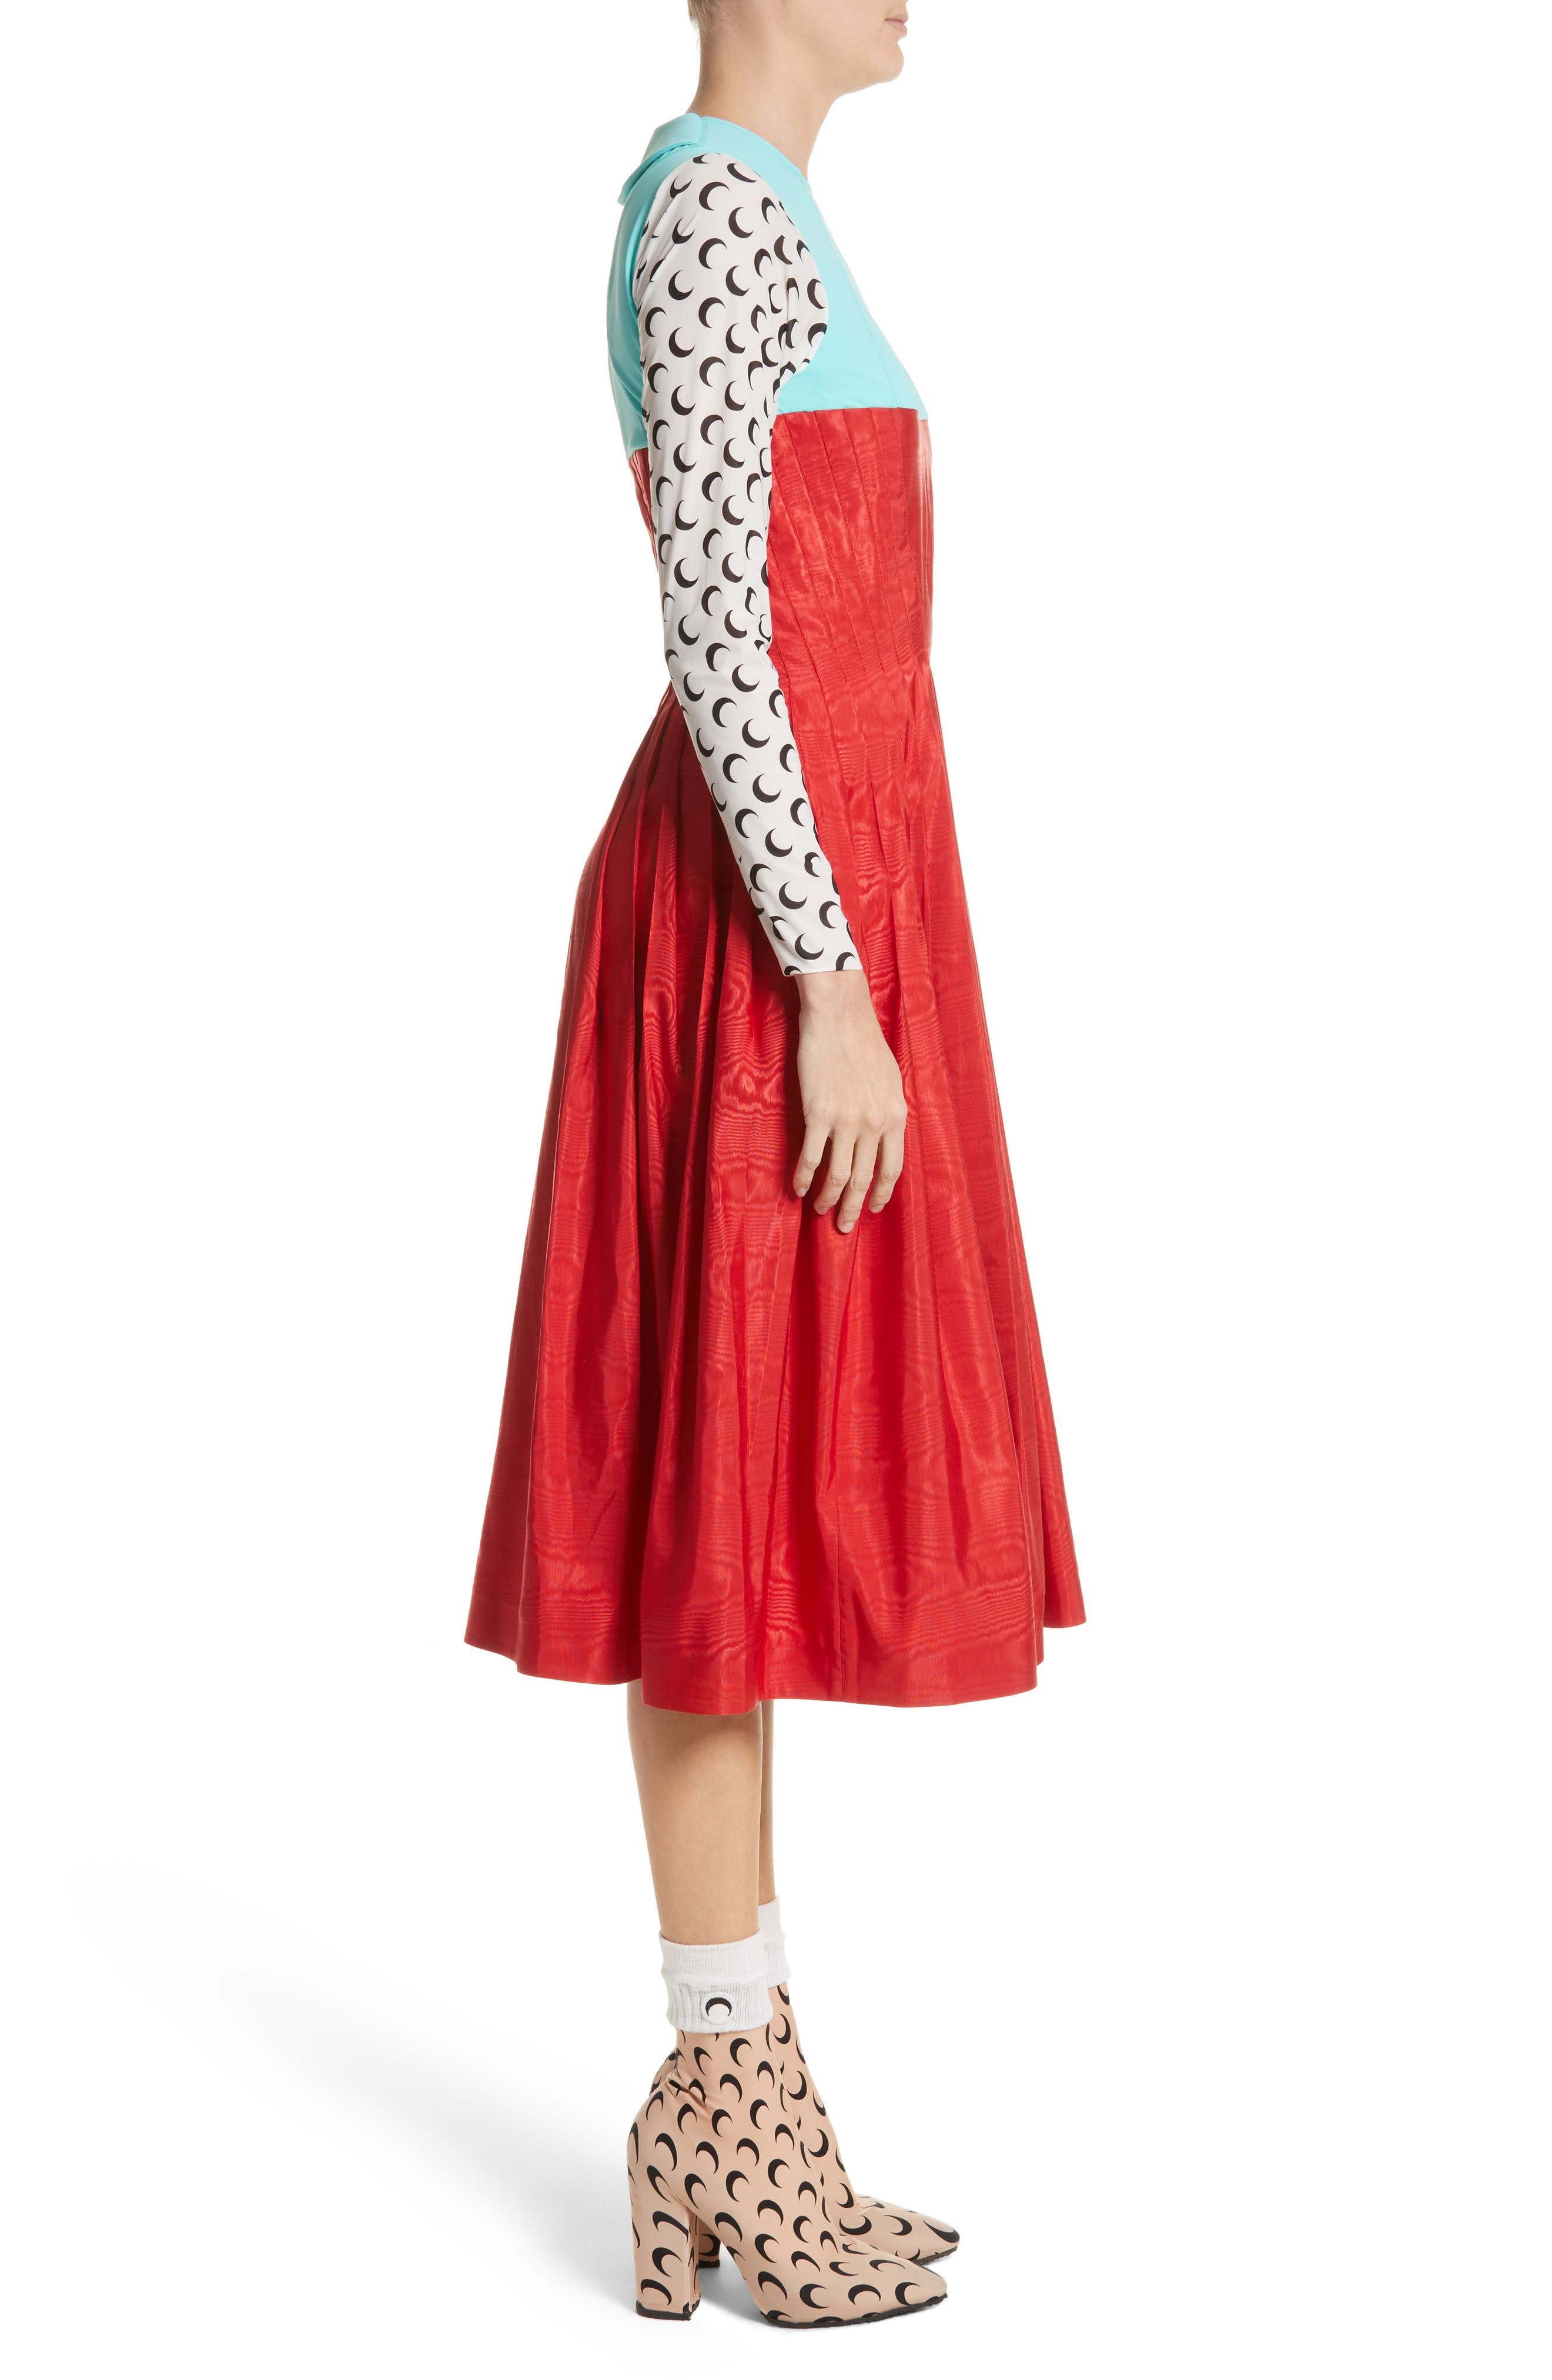 Hybrid Moiré Dress,                             Alternate thumbnail 3, color,                             Turquoise/ Red